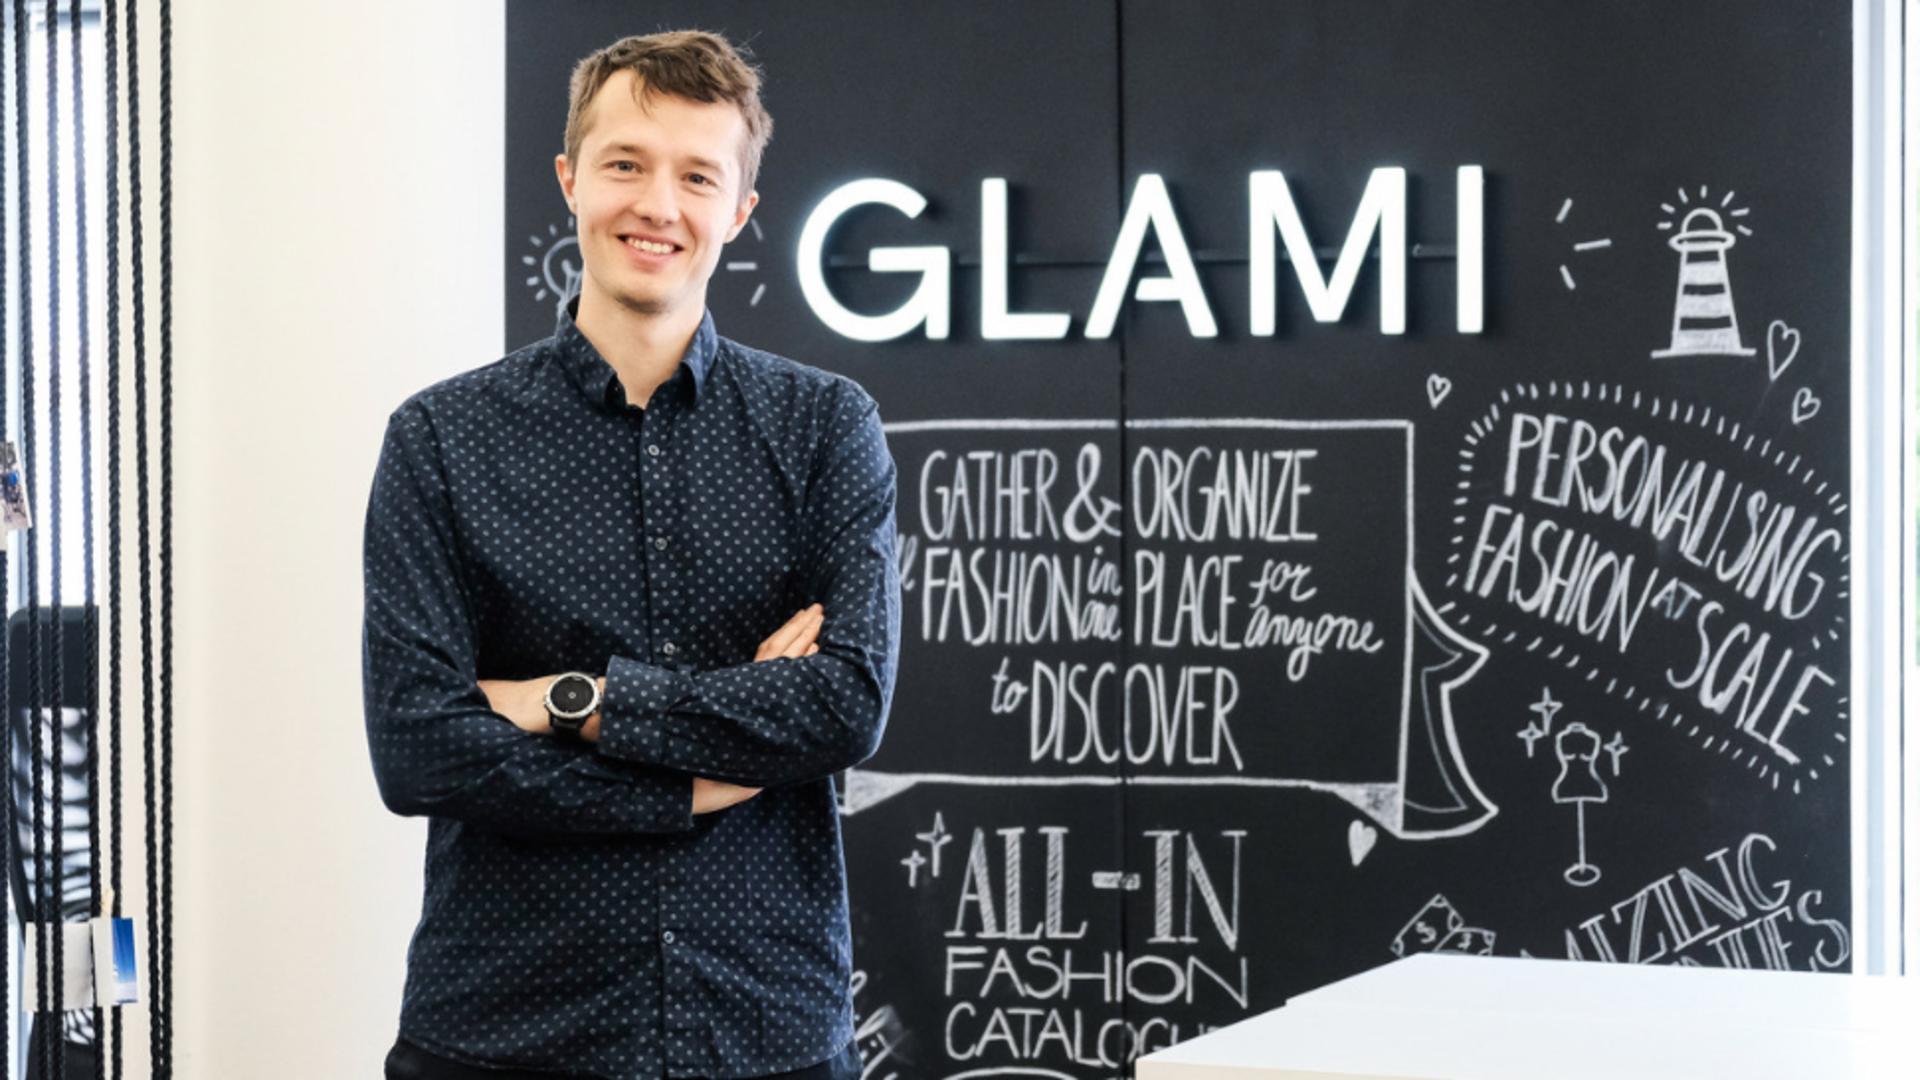 Interviu cu Tomas Hodbod, CEO GLAMI